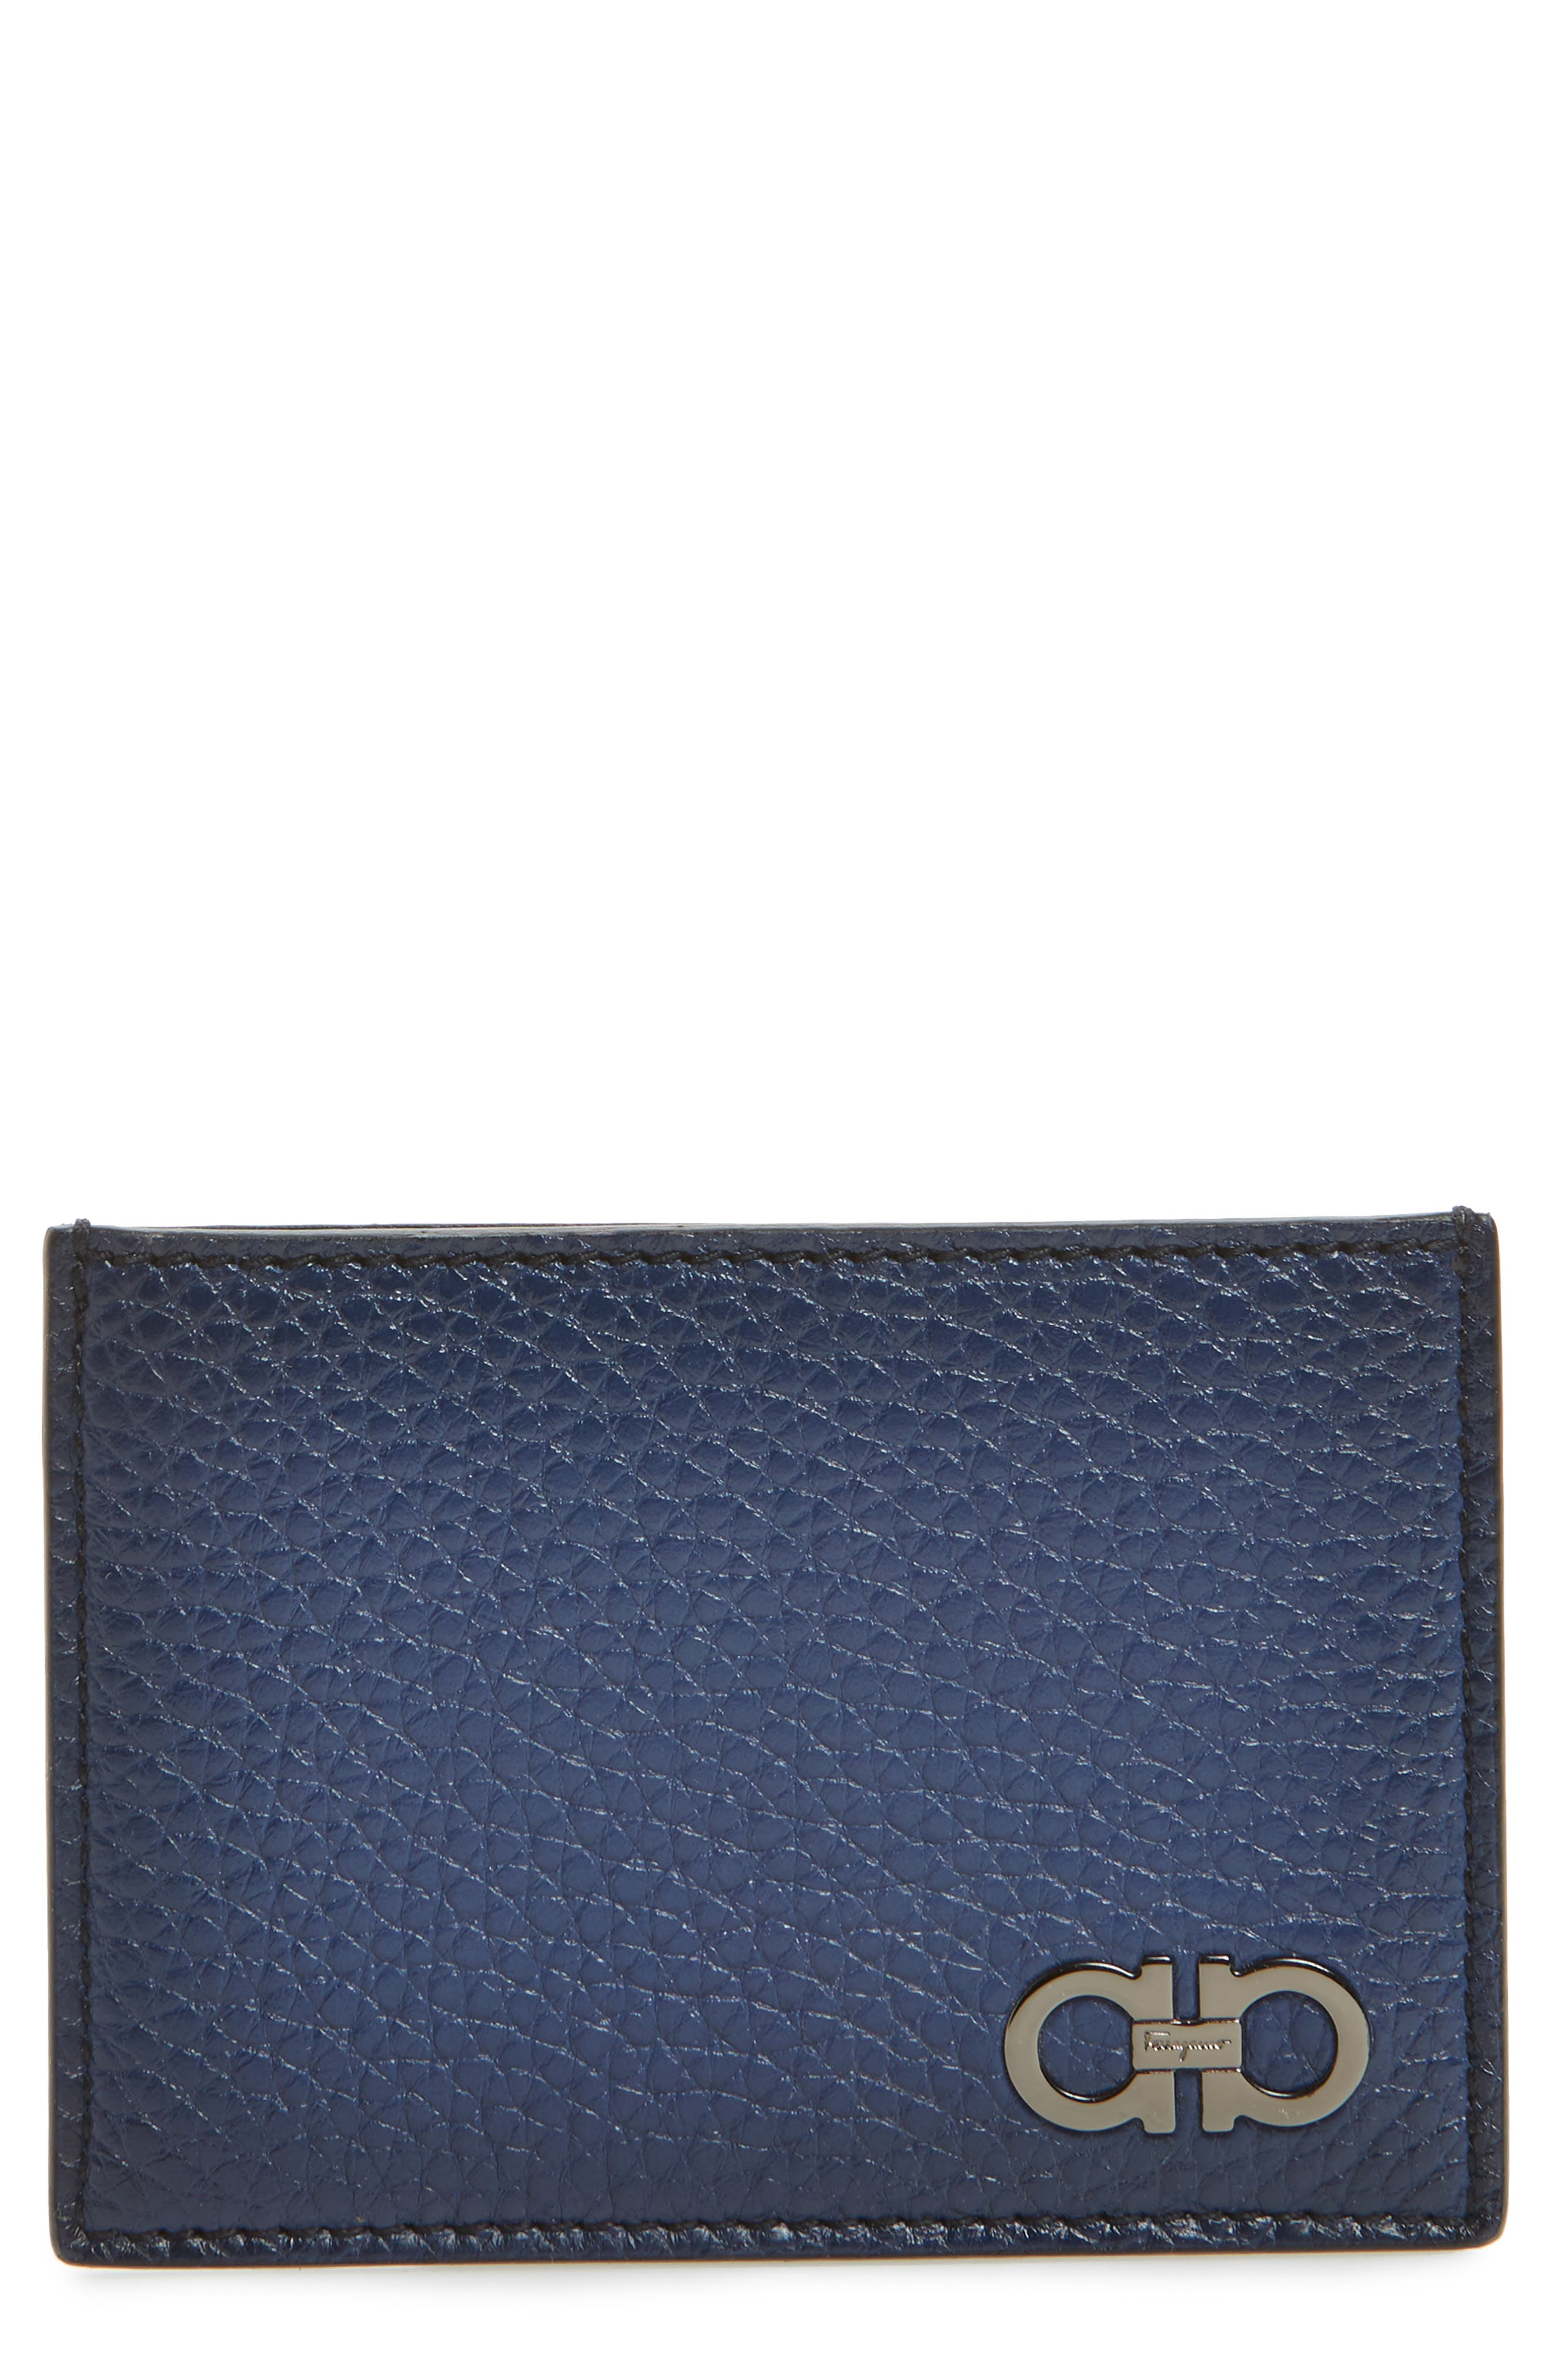 Revival Leather Card Case,                         Main,                         color, Blue